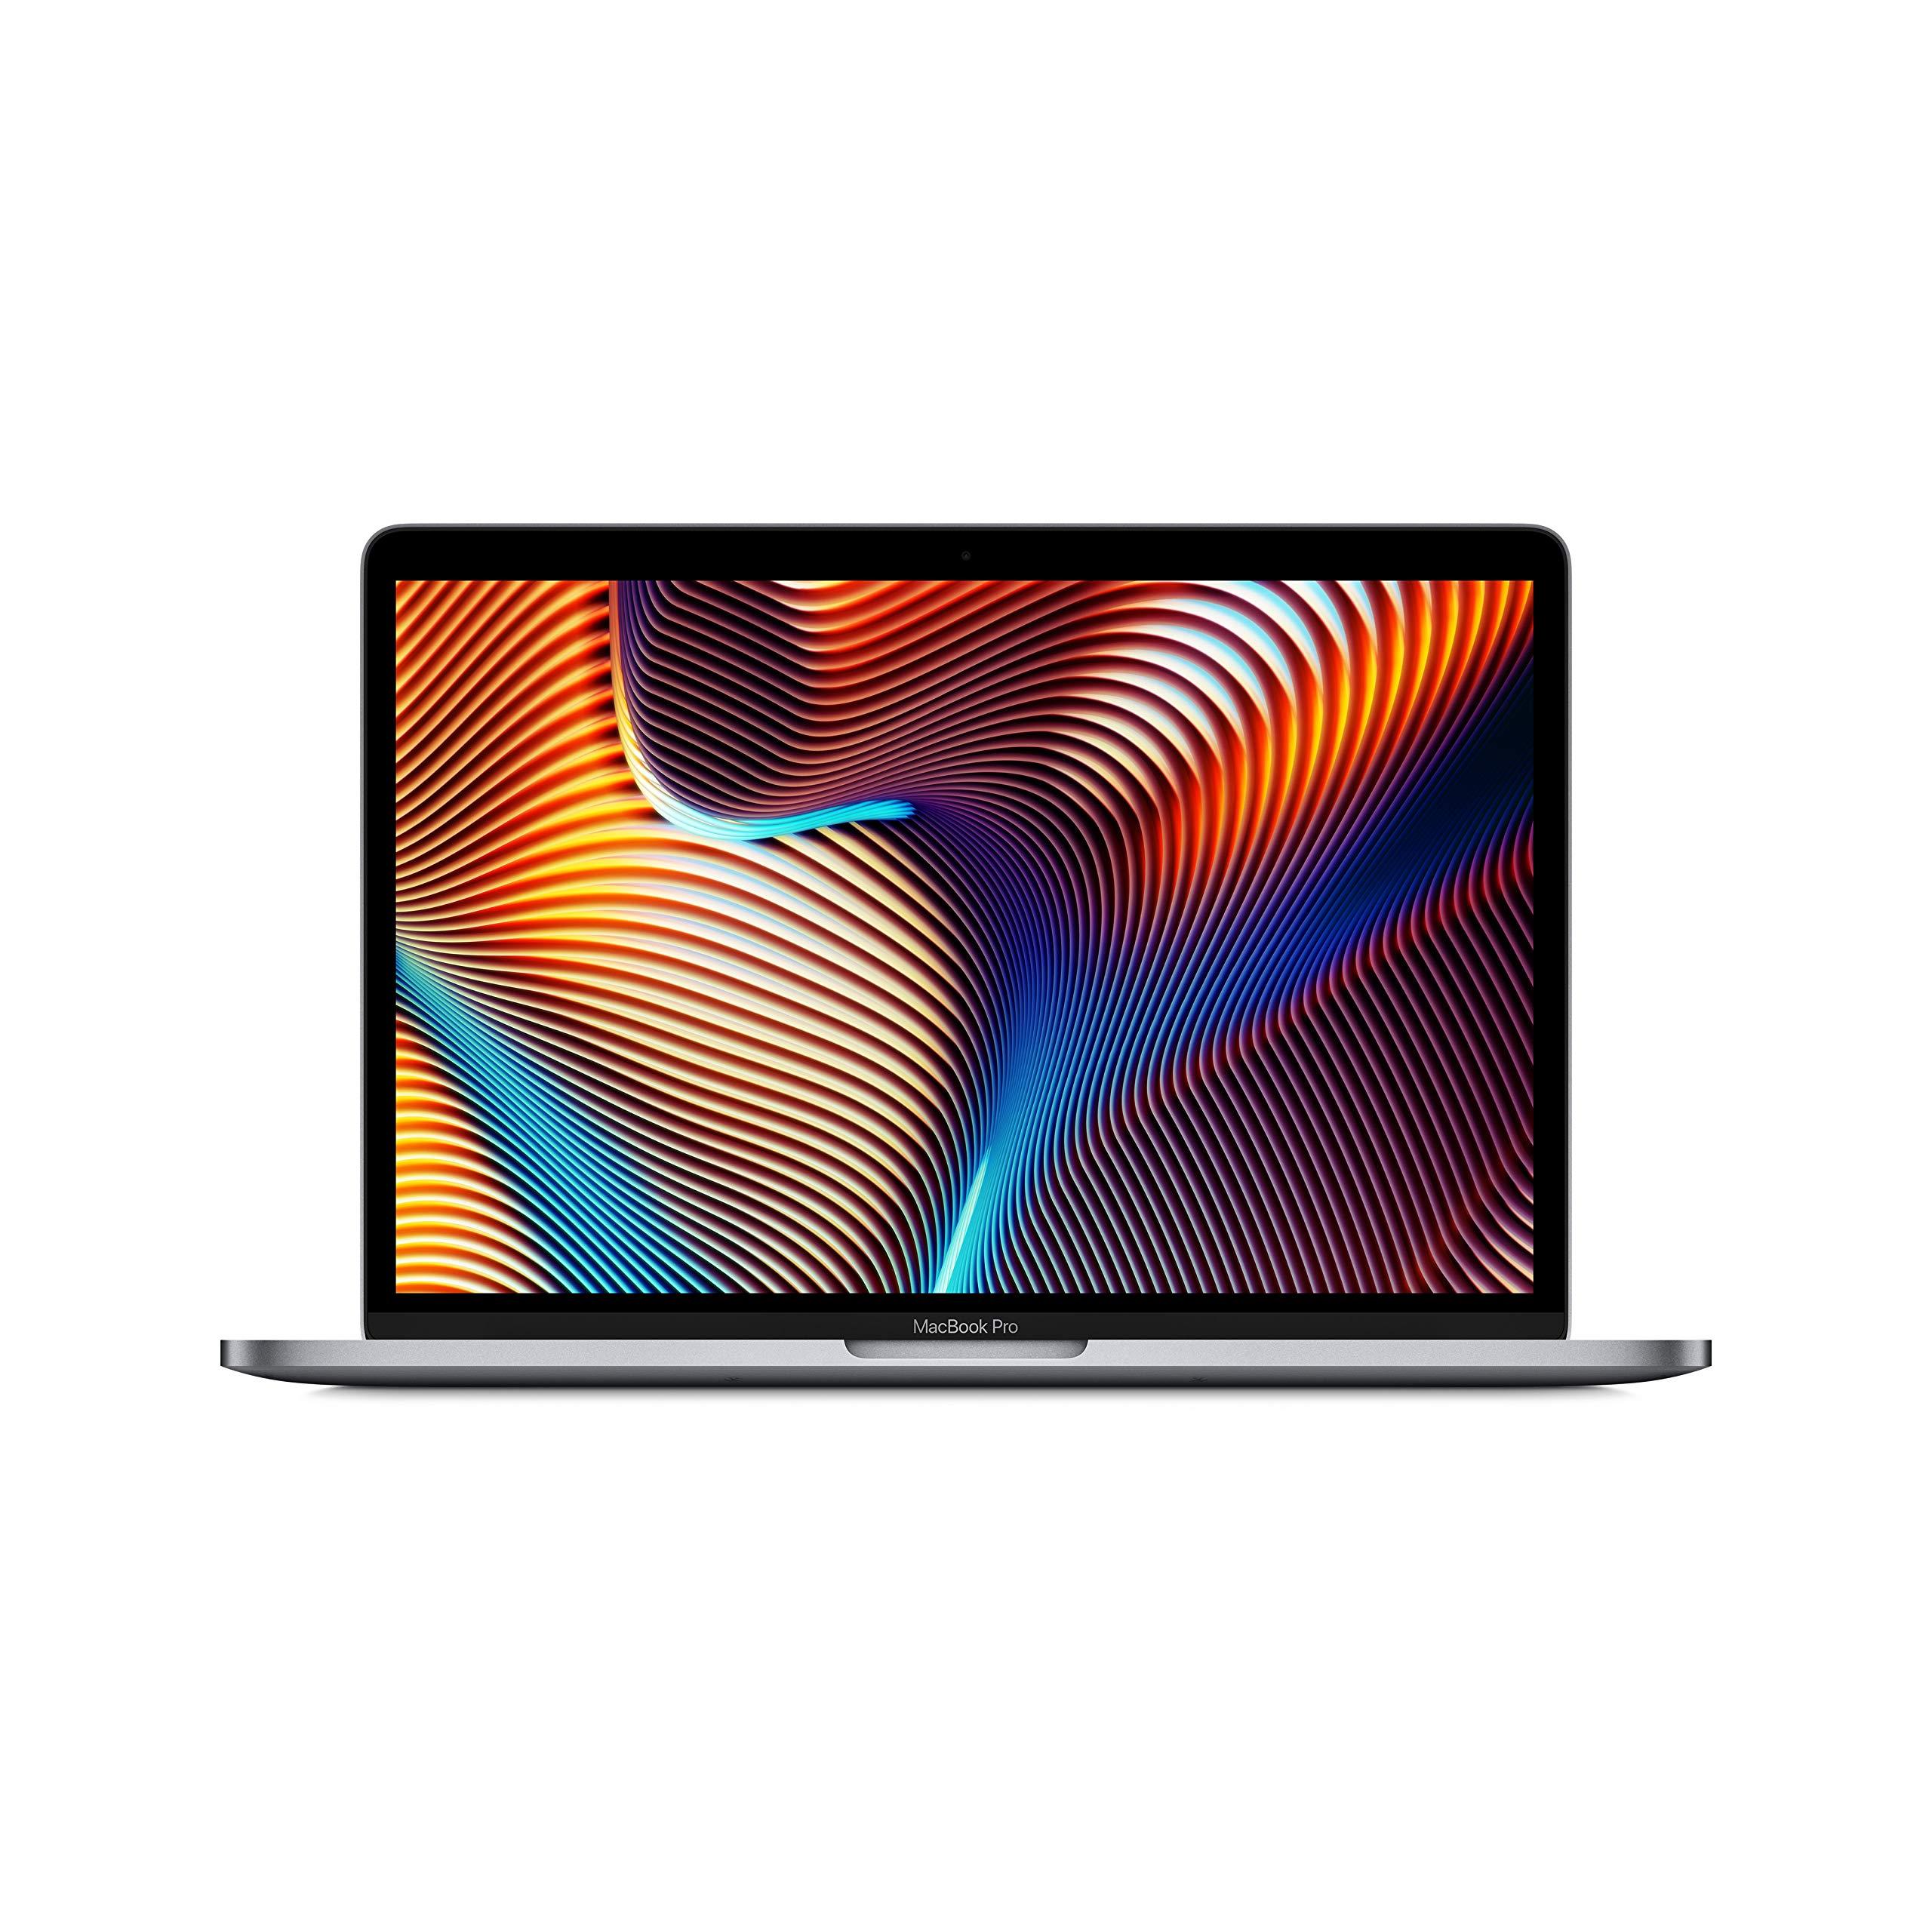 MacBook Pro MV962J/A